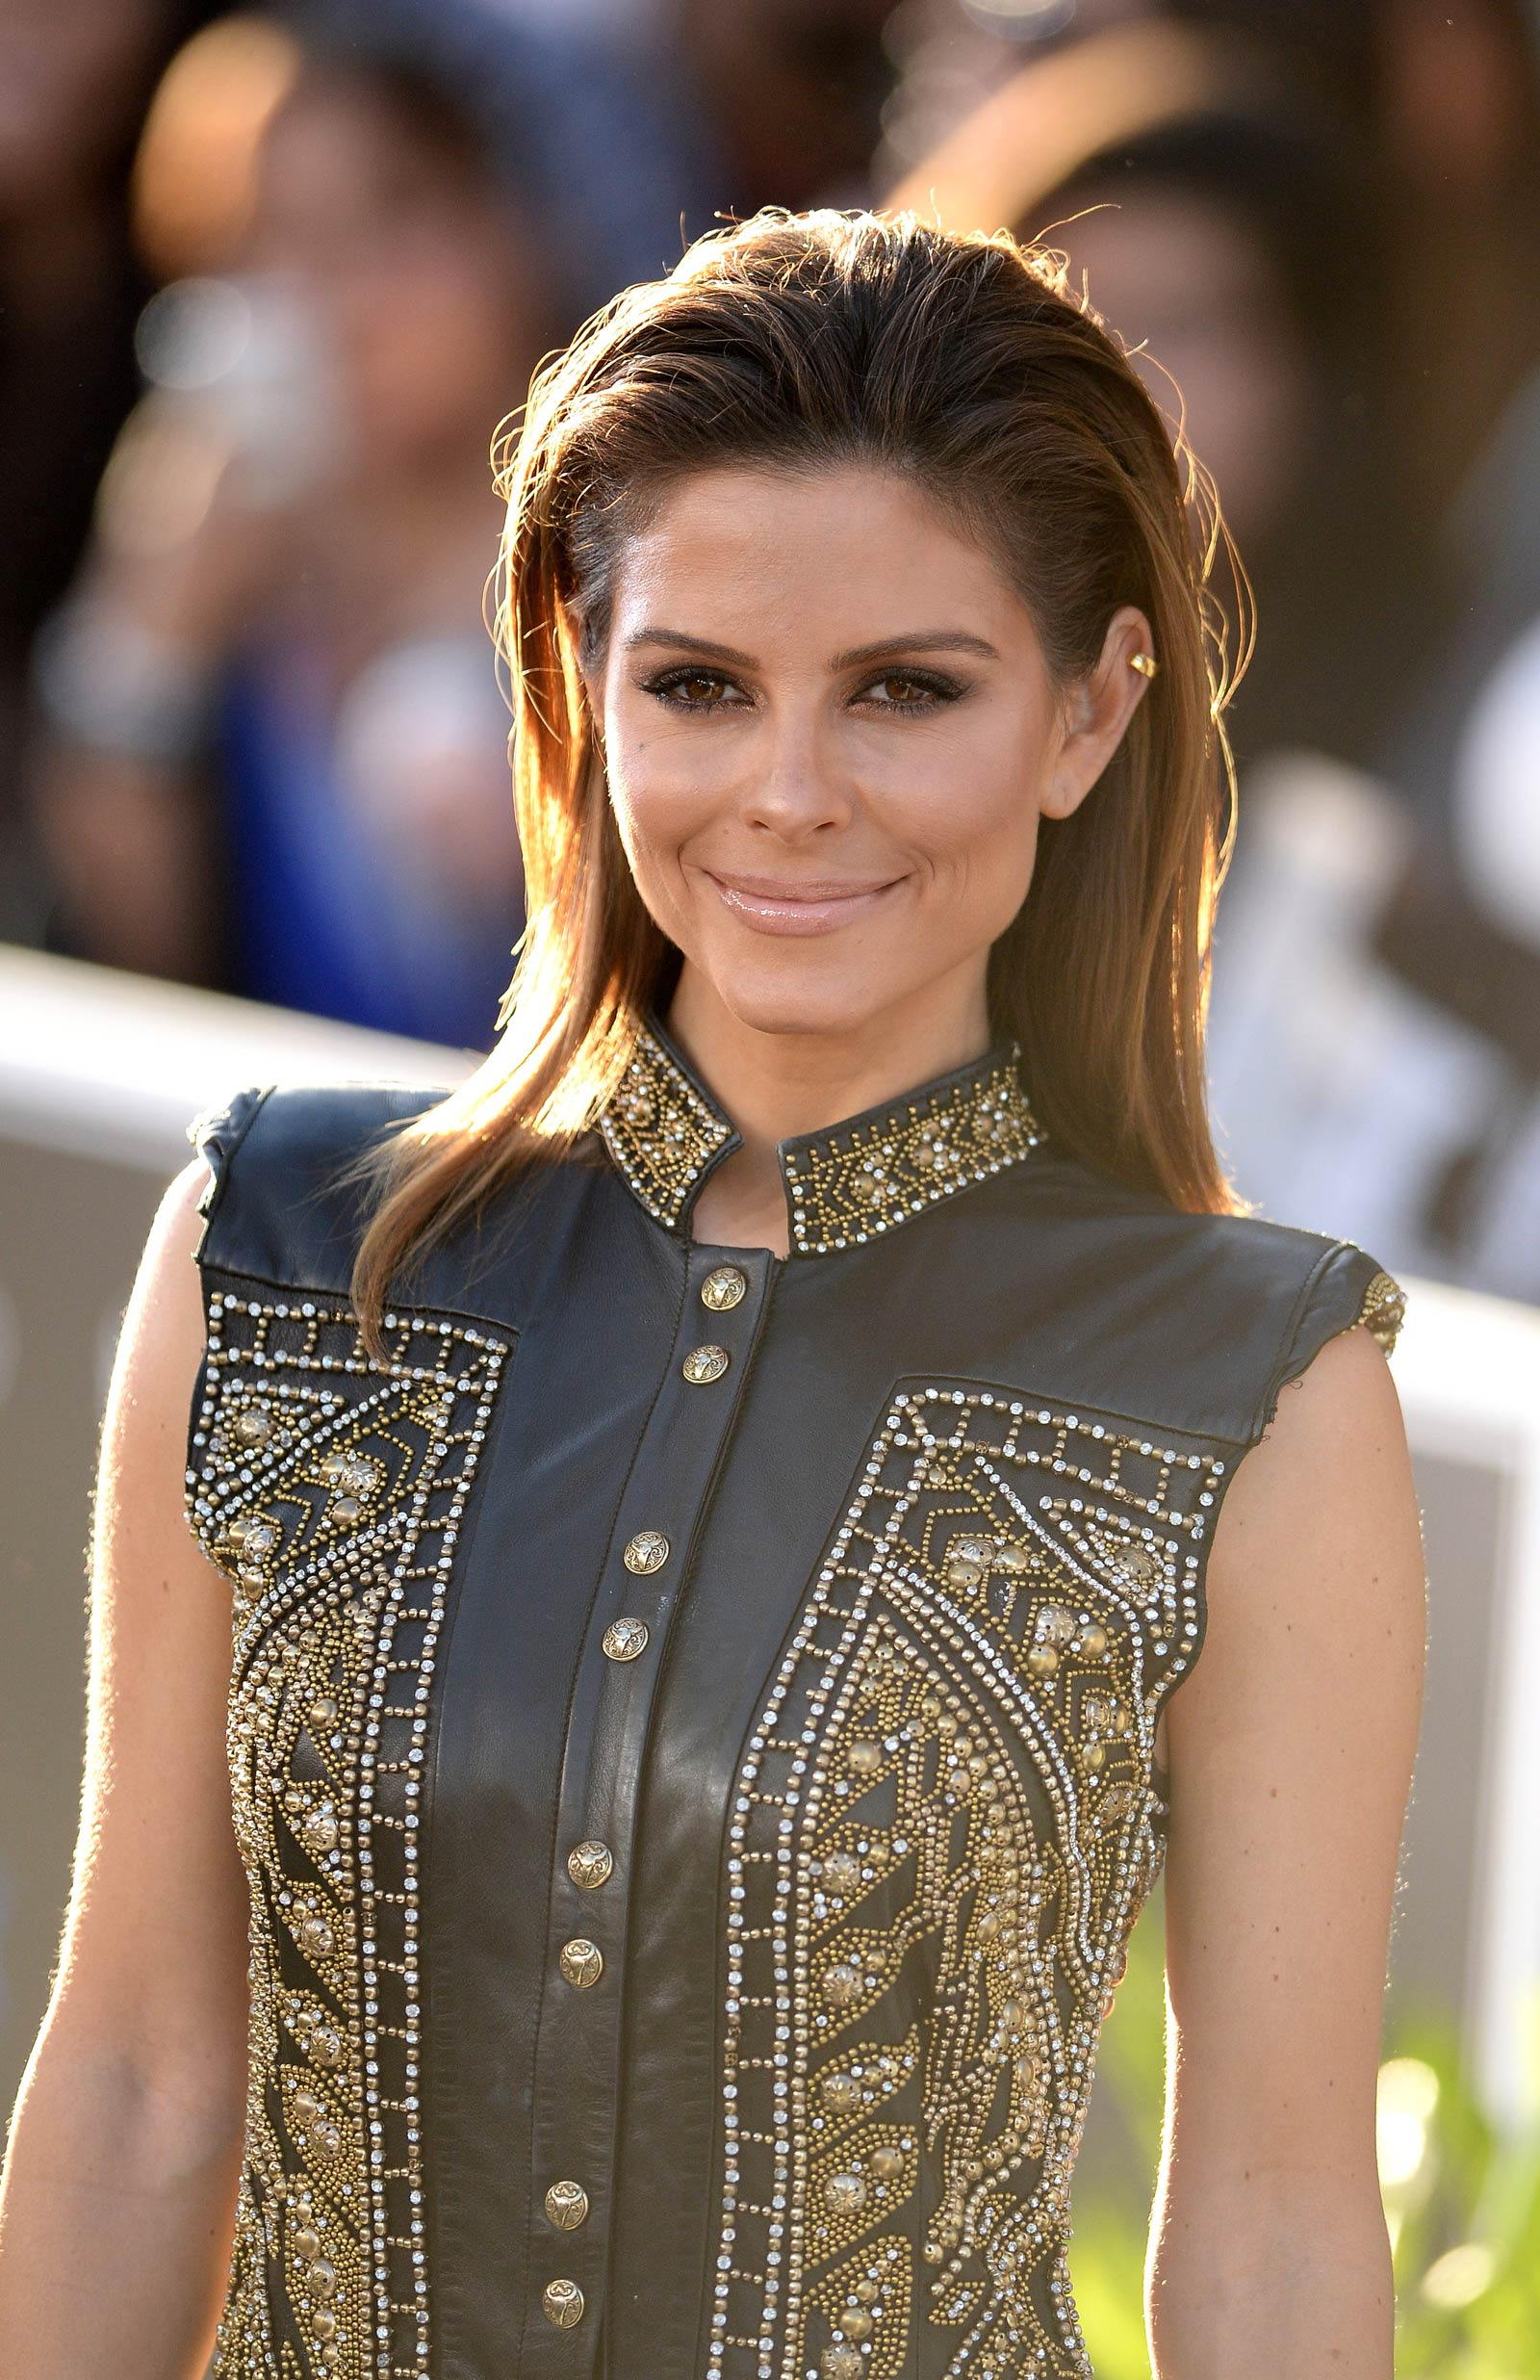 Maria Menounos attends Furious 7 World Premiere